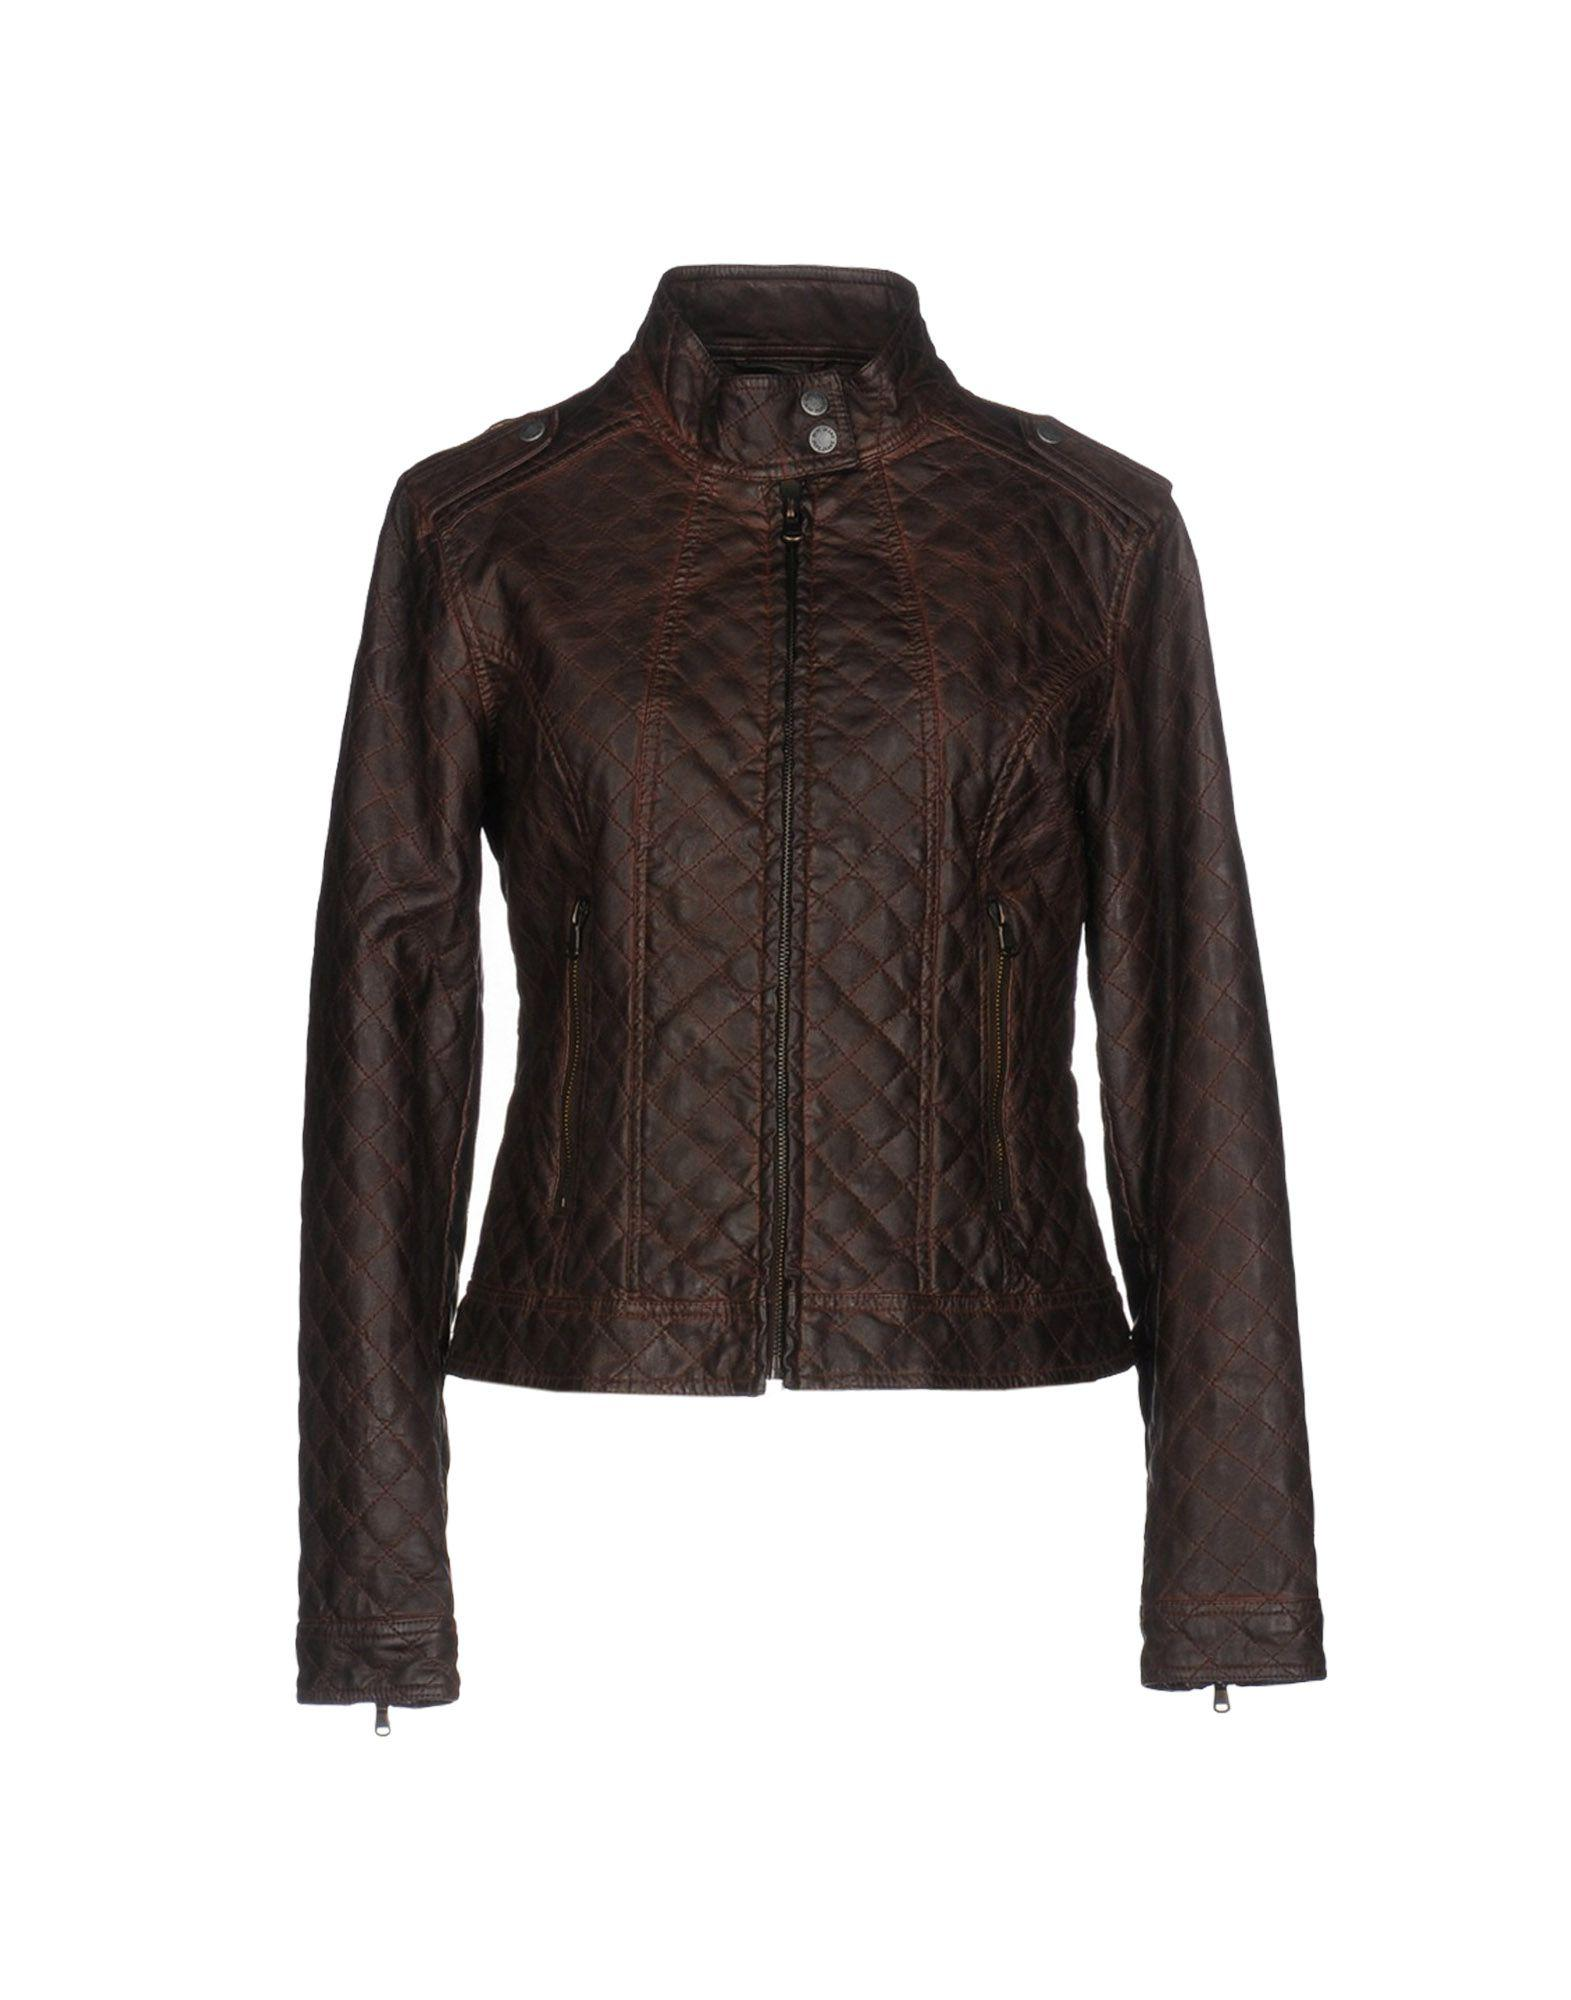 pepe jeans jacket in brown lyst. Black Bedroom Furniture Sets. Home Design Ideas